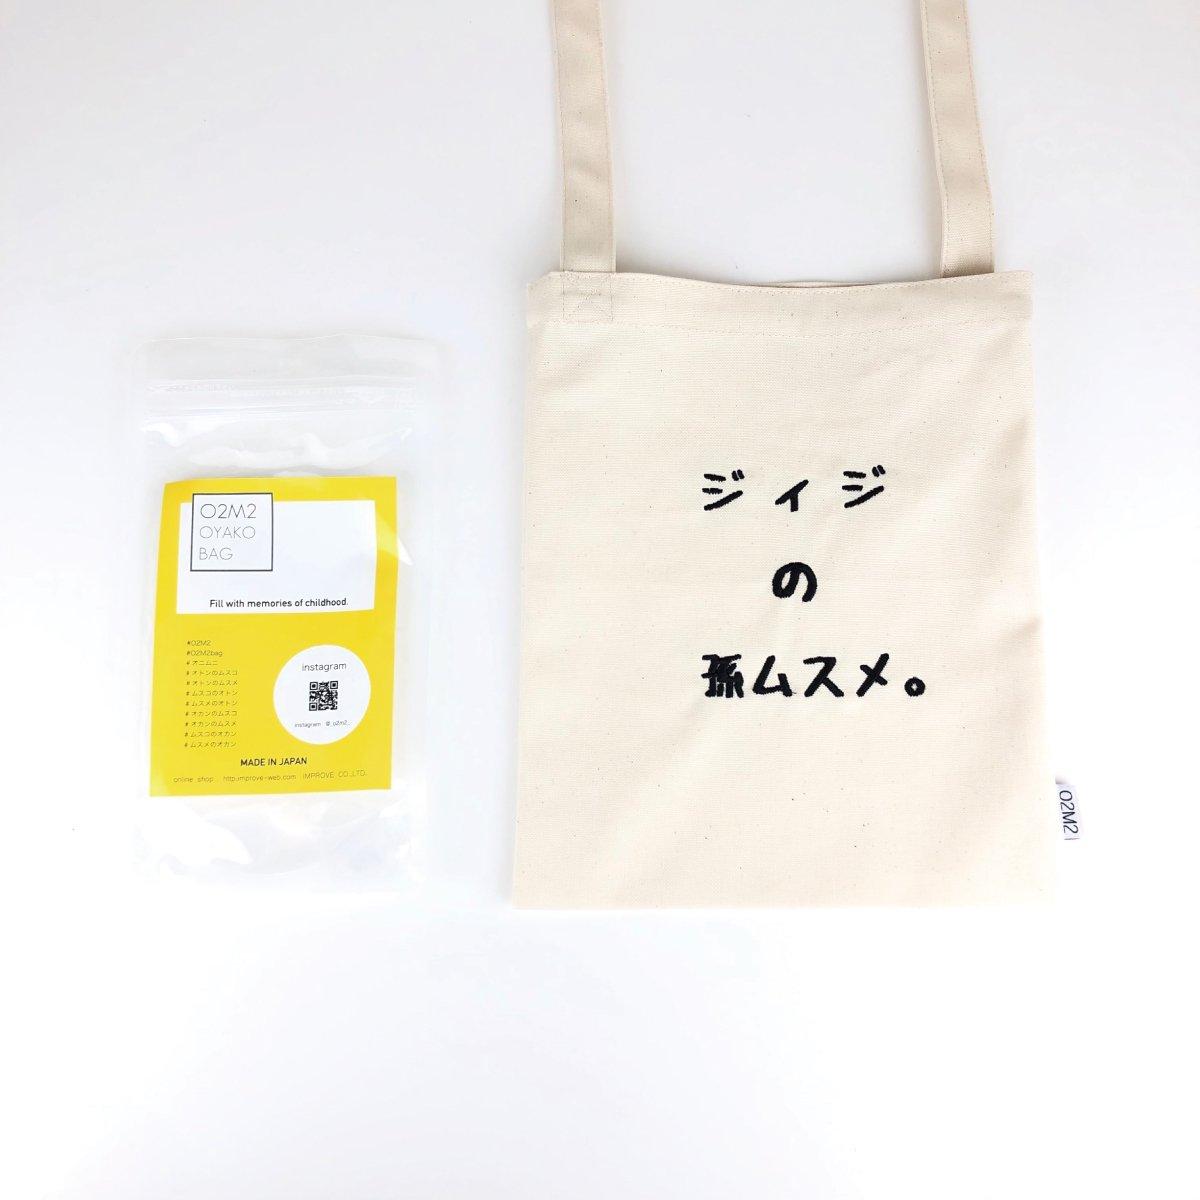 Cotton HF Sacoche(孫・ジィジ&バァバシリーズ) 詳細画像5